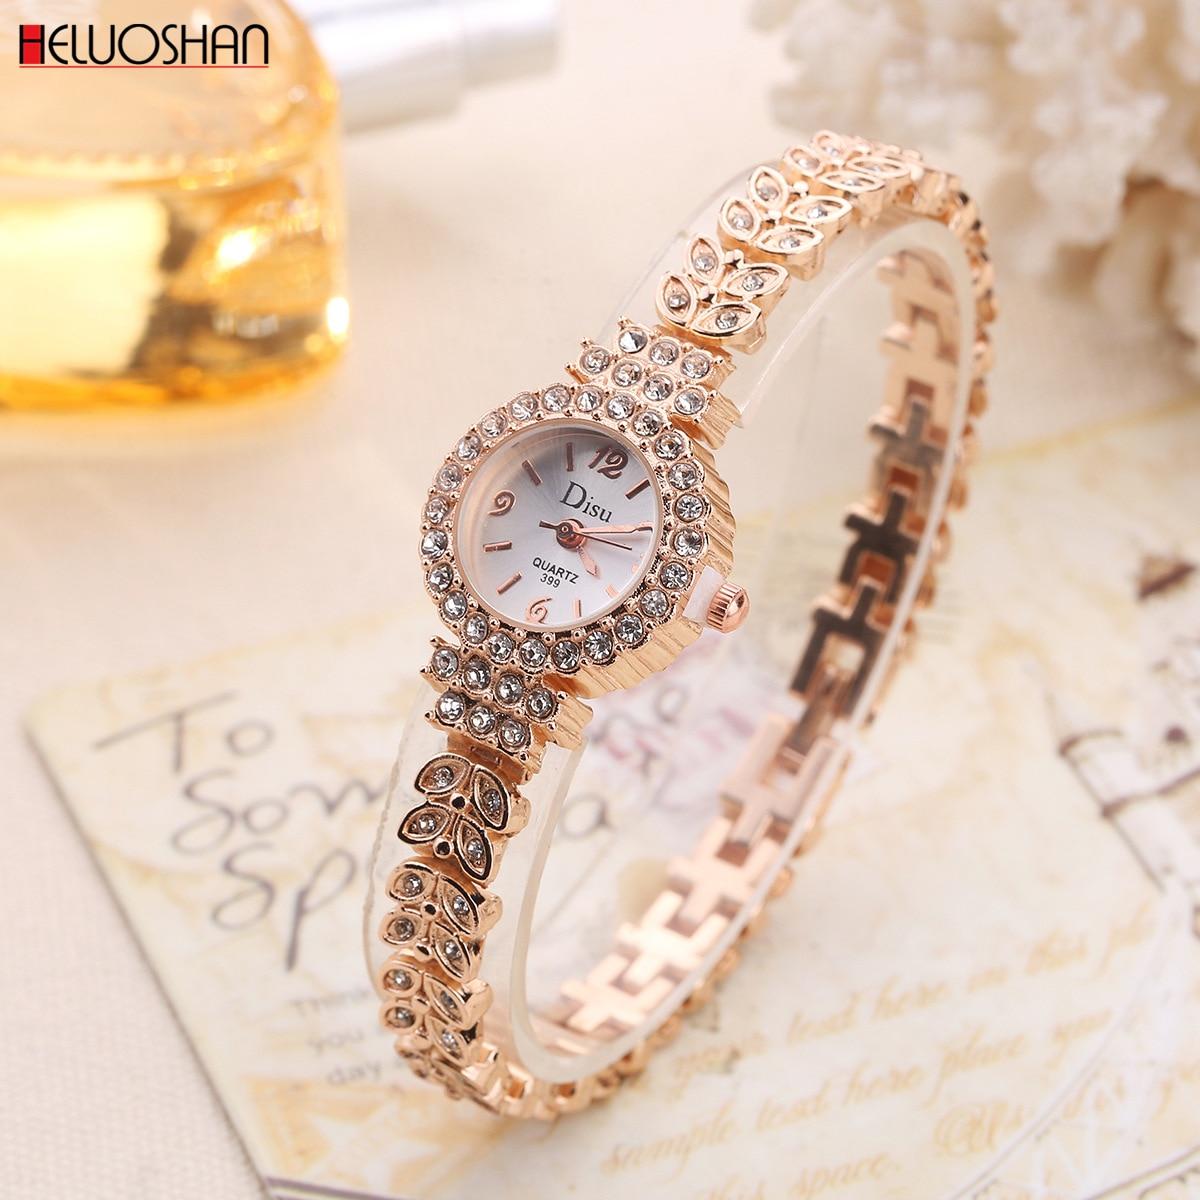 New Gold Women Bracelet Watch Luxury Leaves Shape Alloy Band Quartz Wrist Watches Women Fashion Luxury Dress Watches reloj mujer